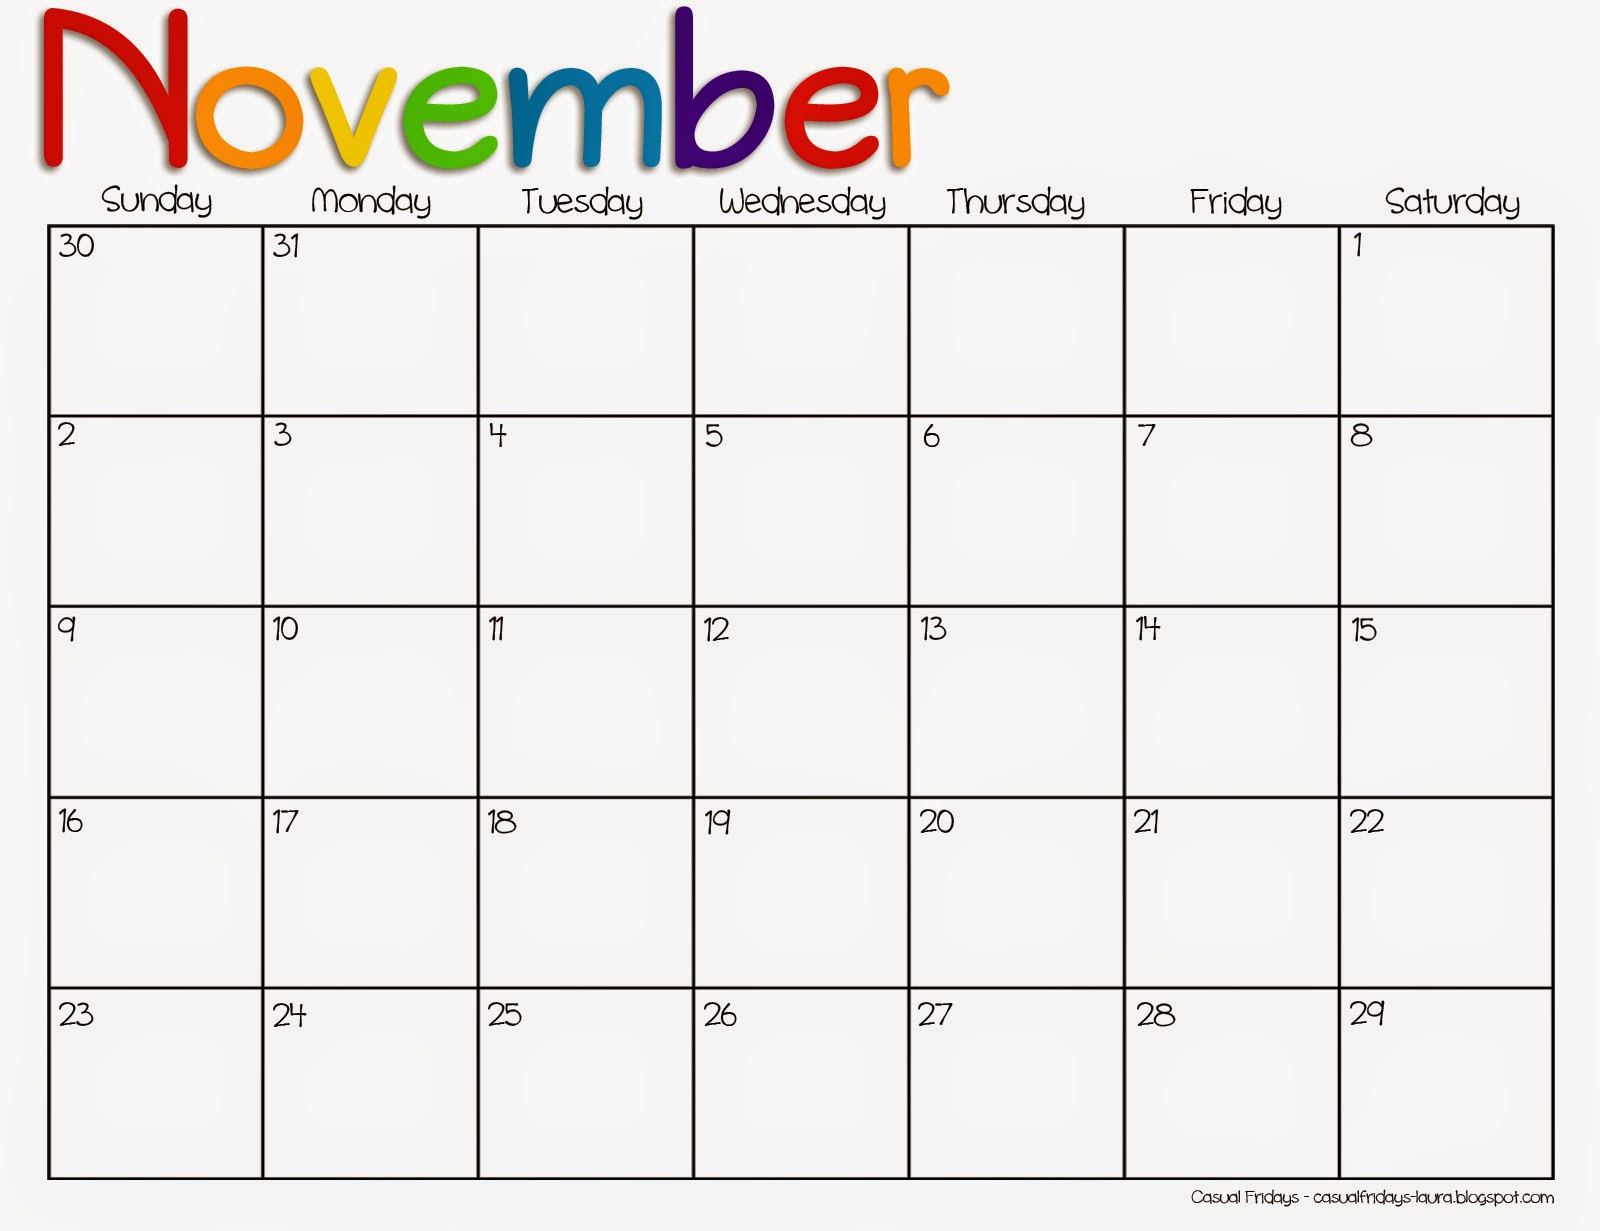 November 2016 Printable Calendar